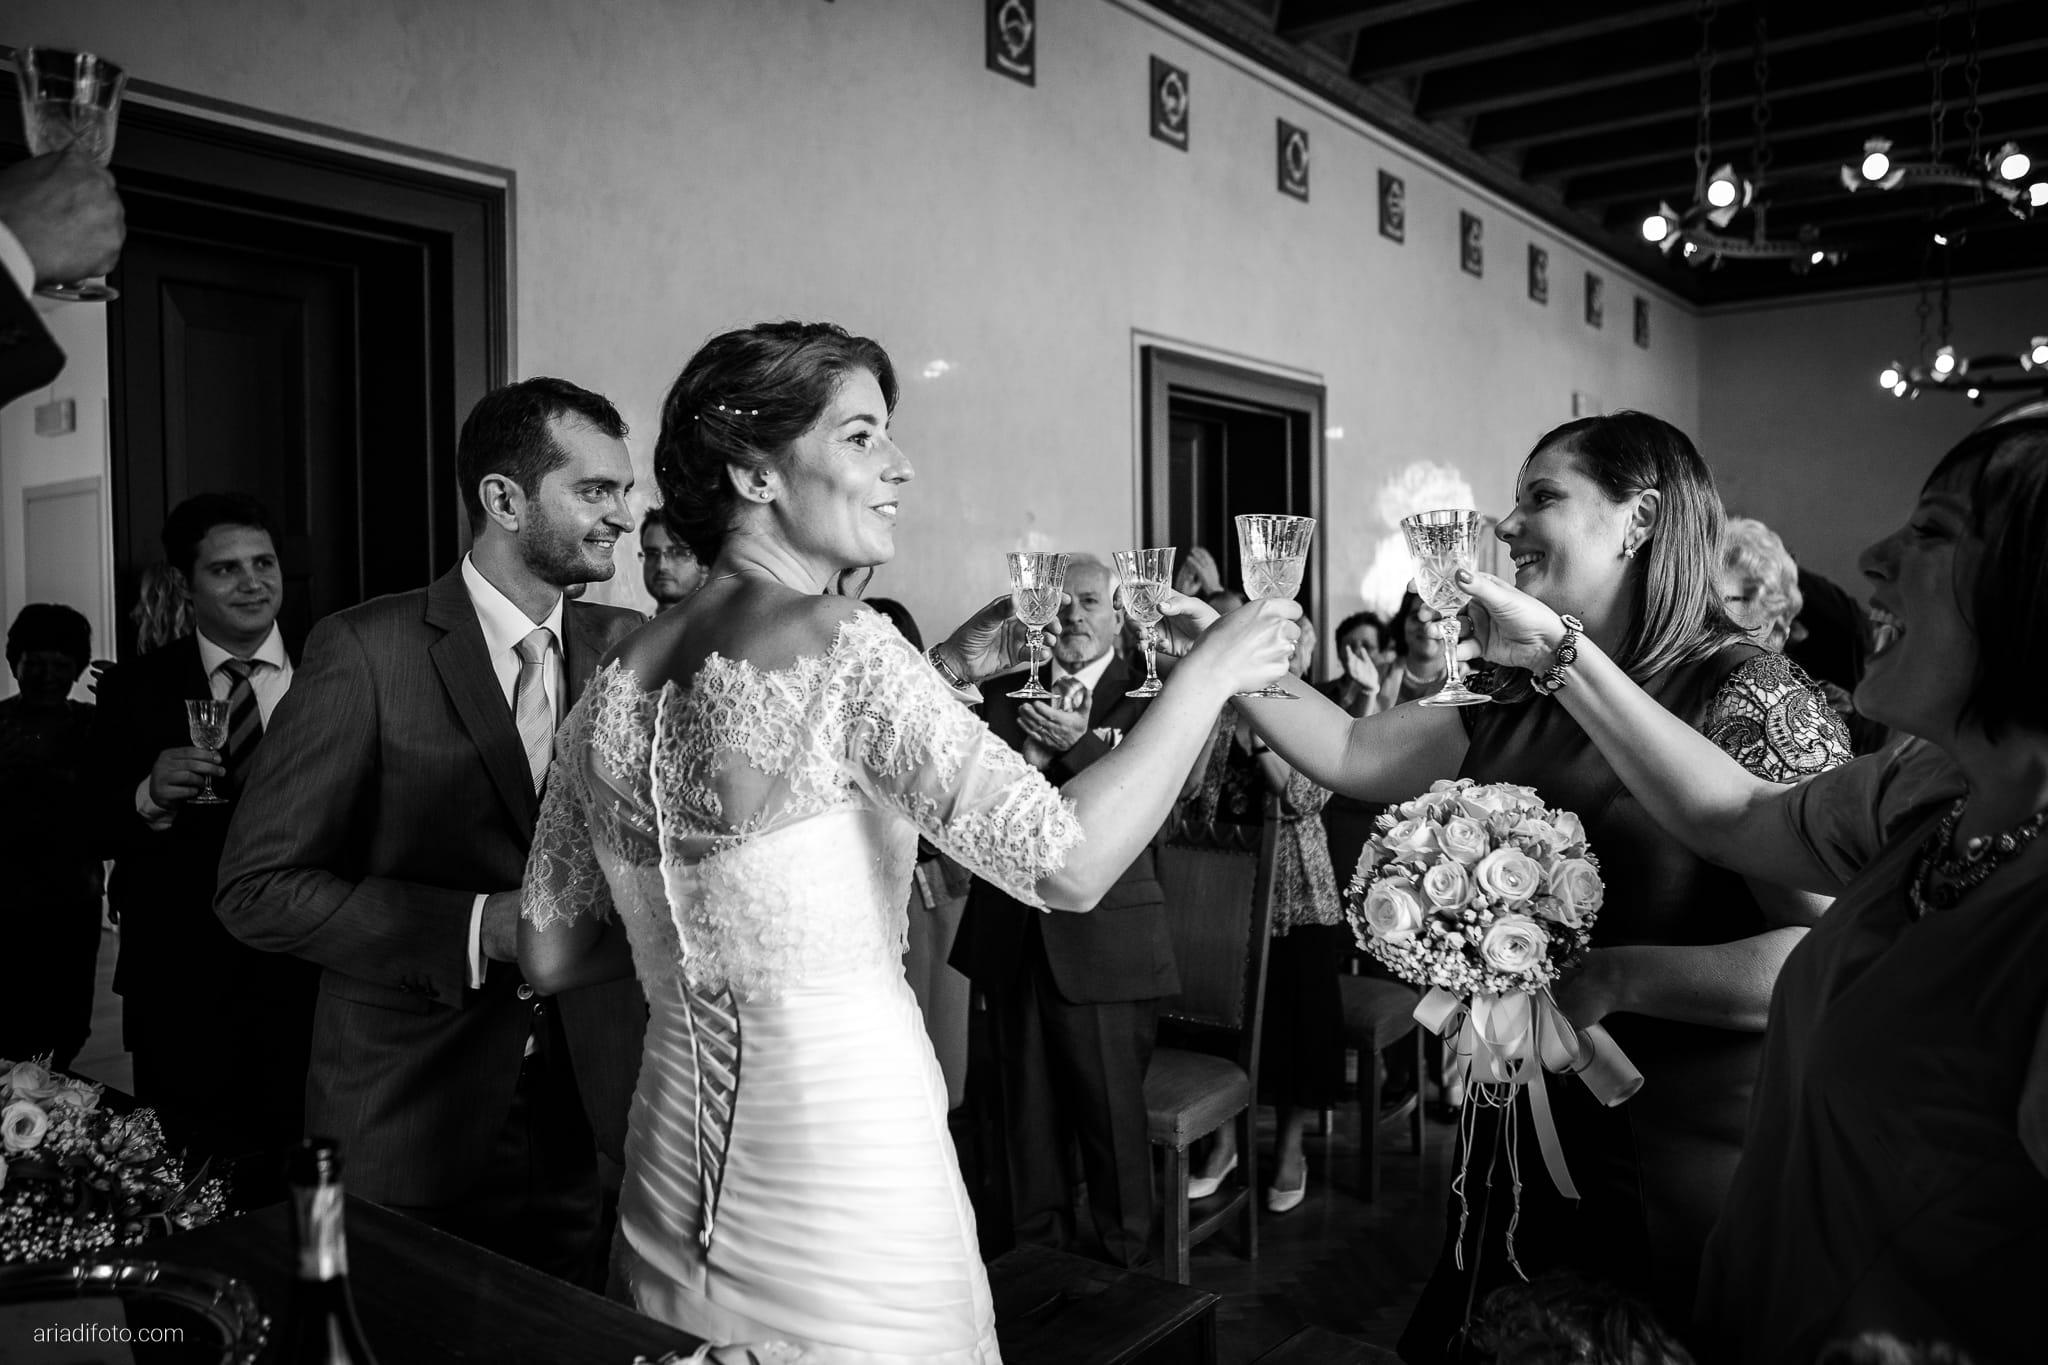 Rossella Stefano Matrimonio Municipio di Muggia Mulin Koper Slovenia cerimonia brindisi